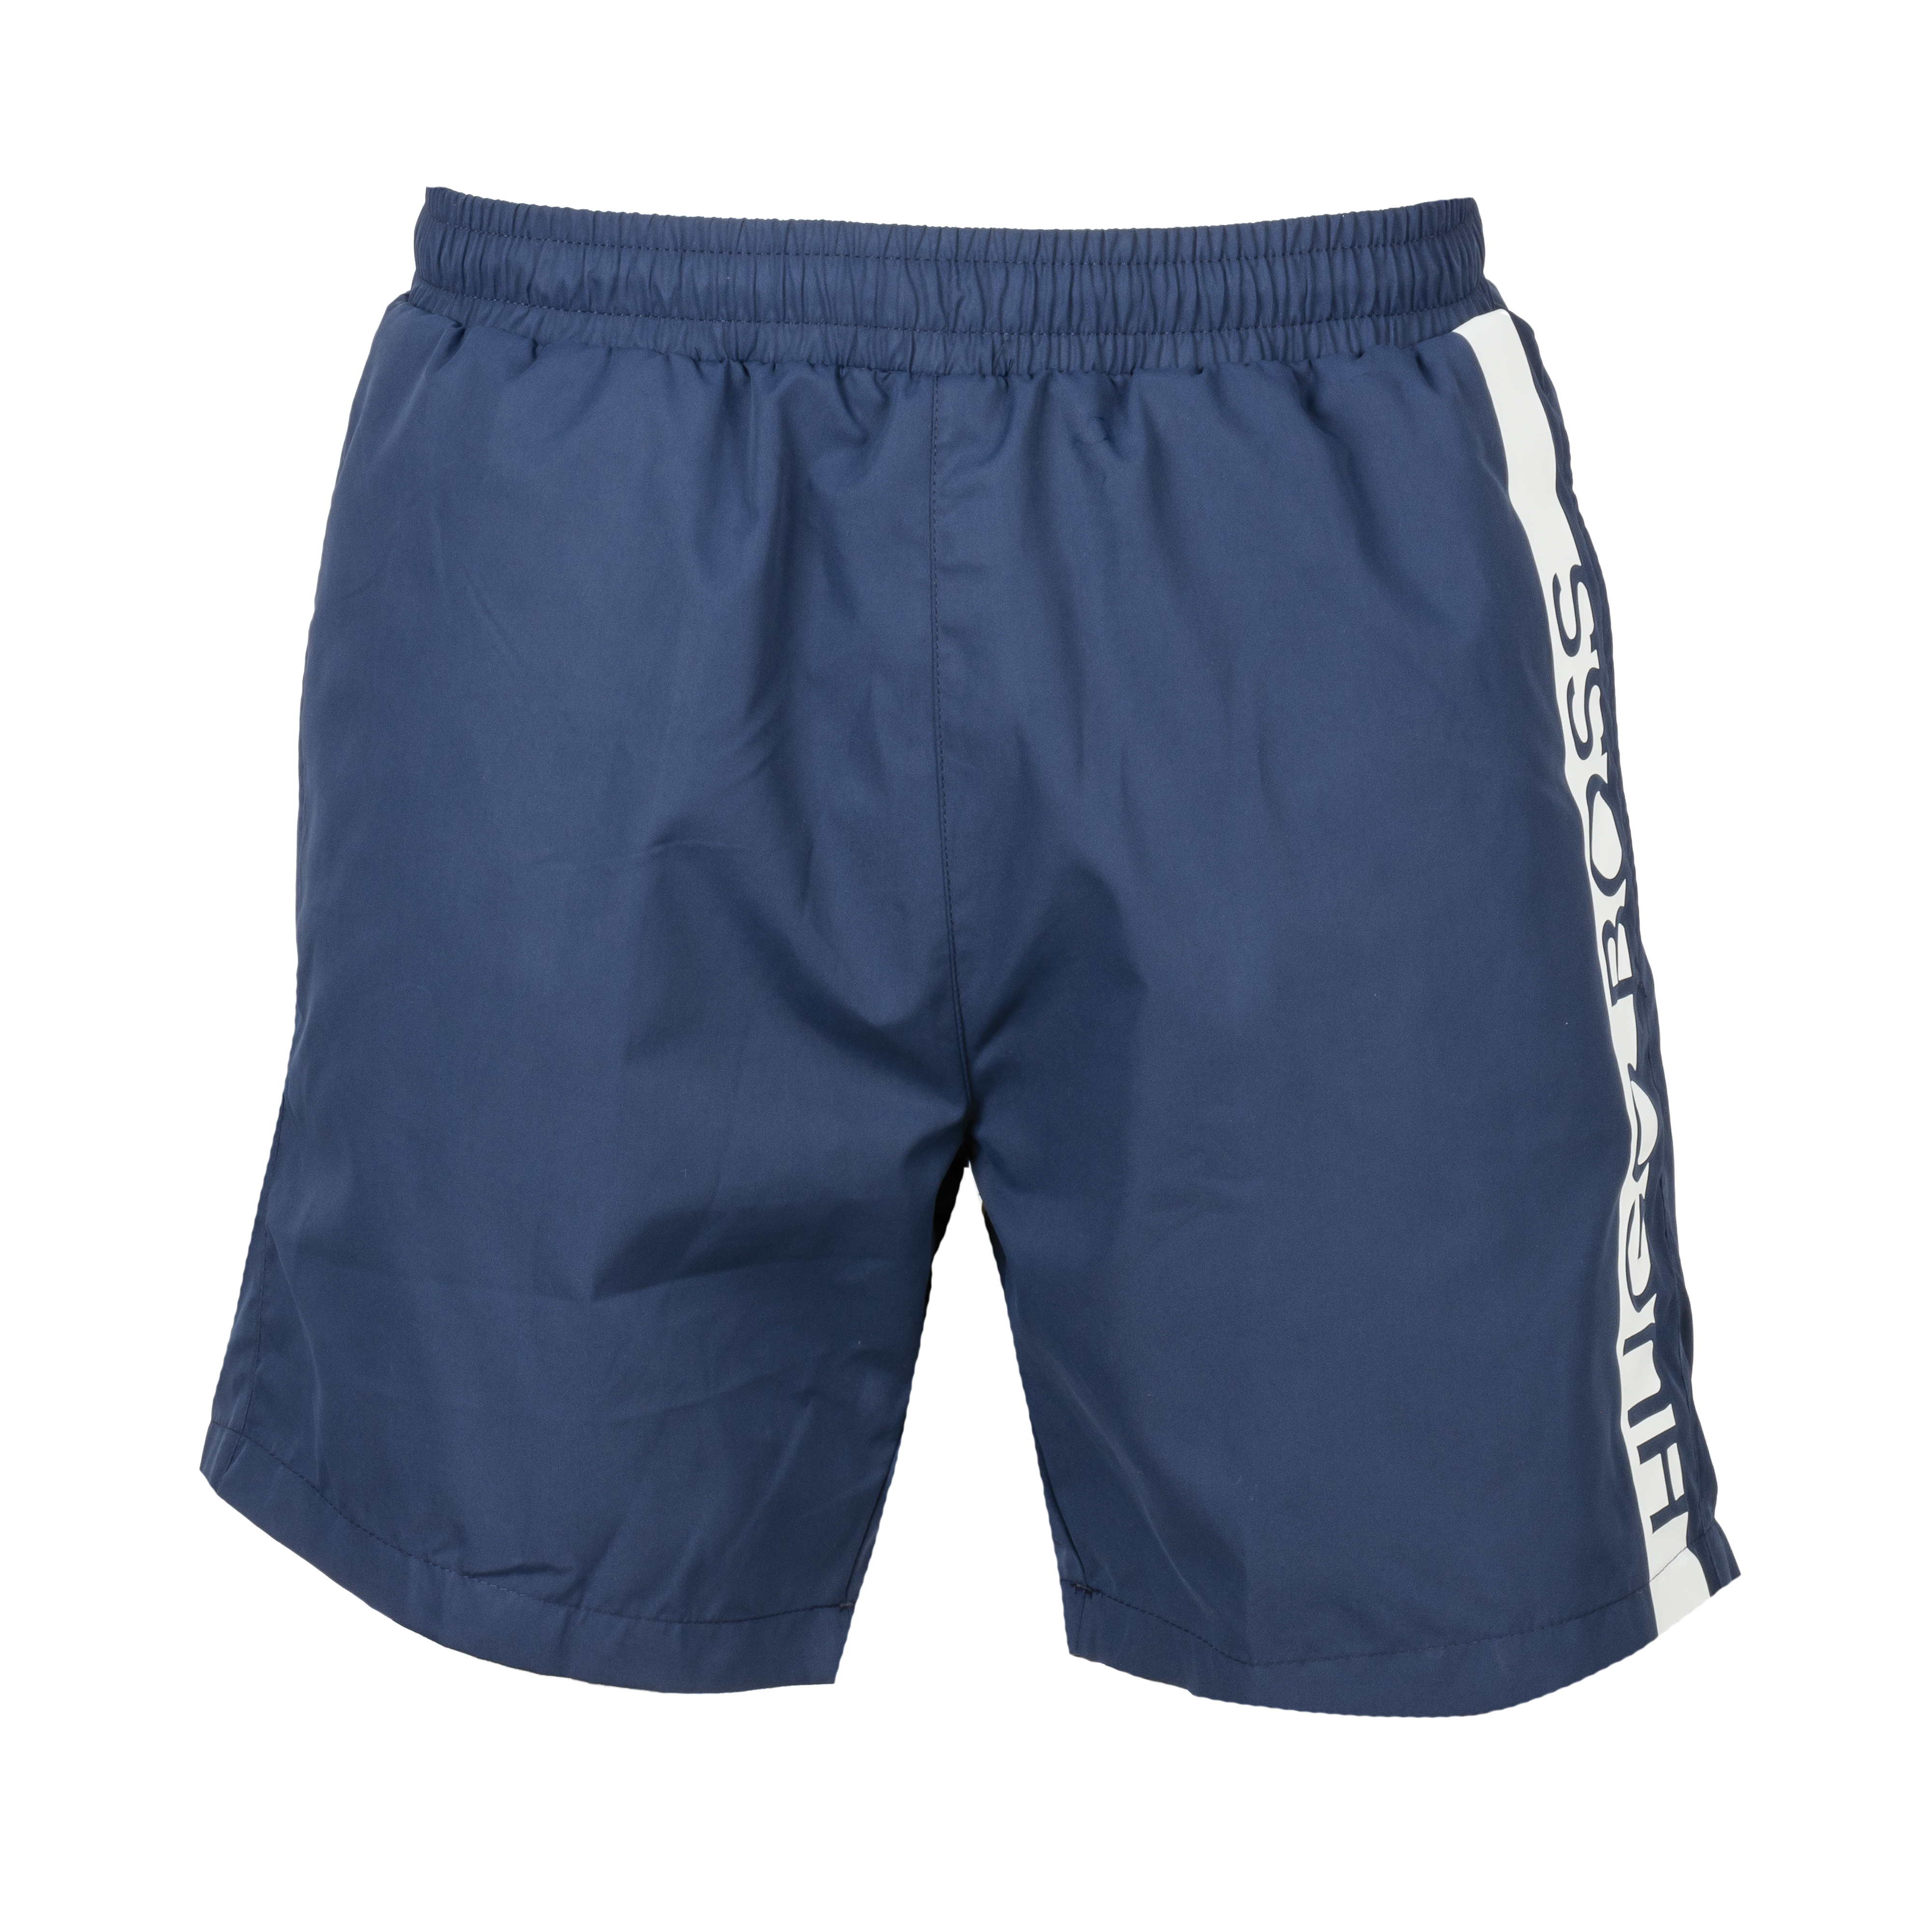 Short de bain  bleu marine à bande blanche logotypée